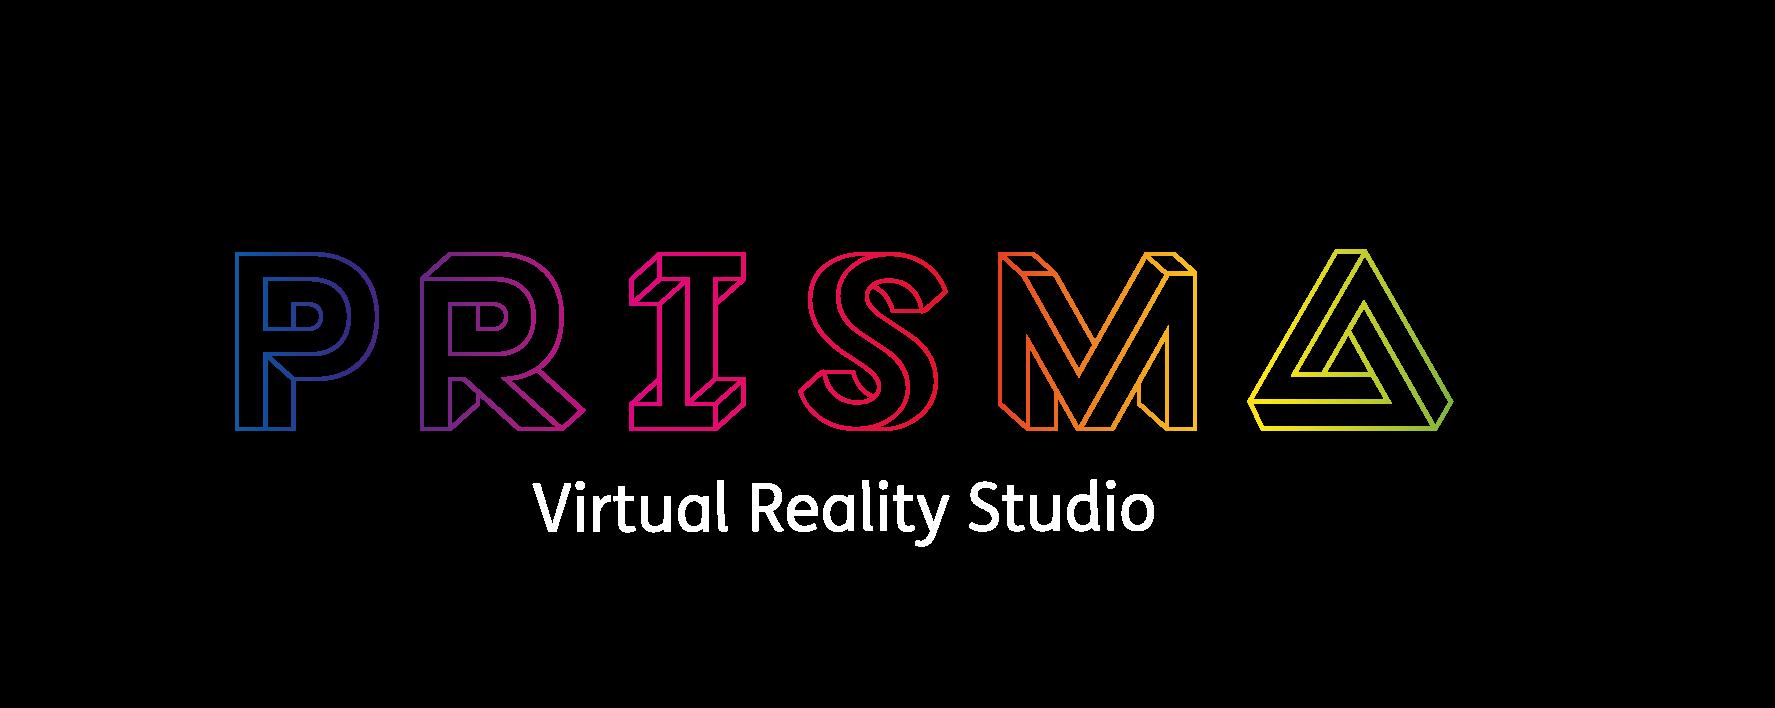 Prisma VR Studio